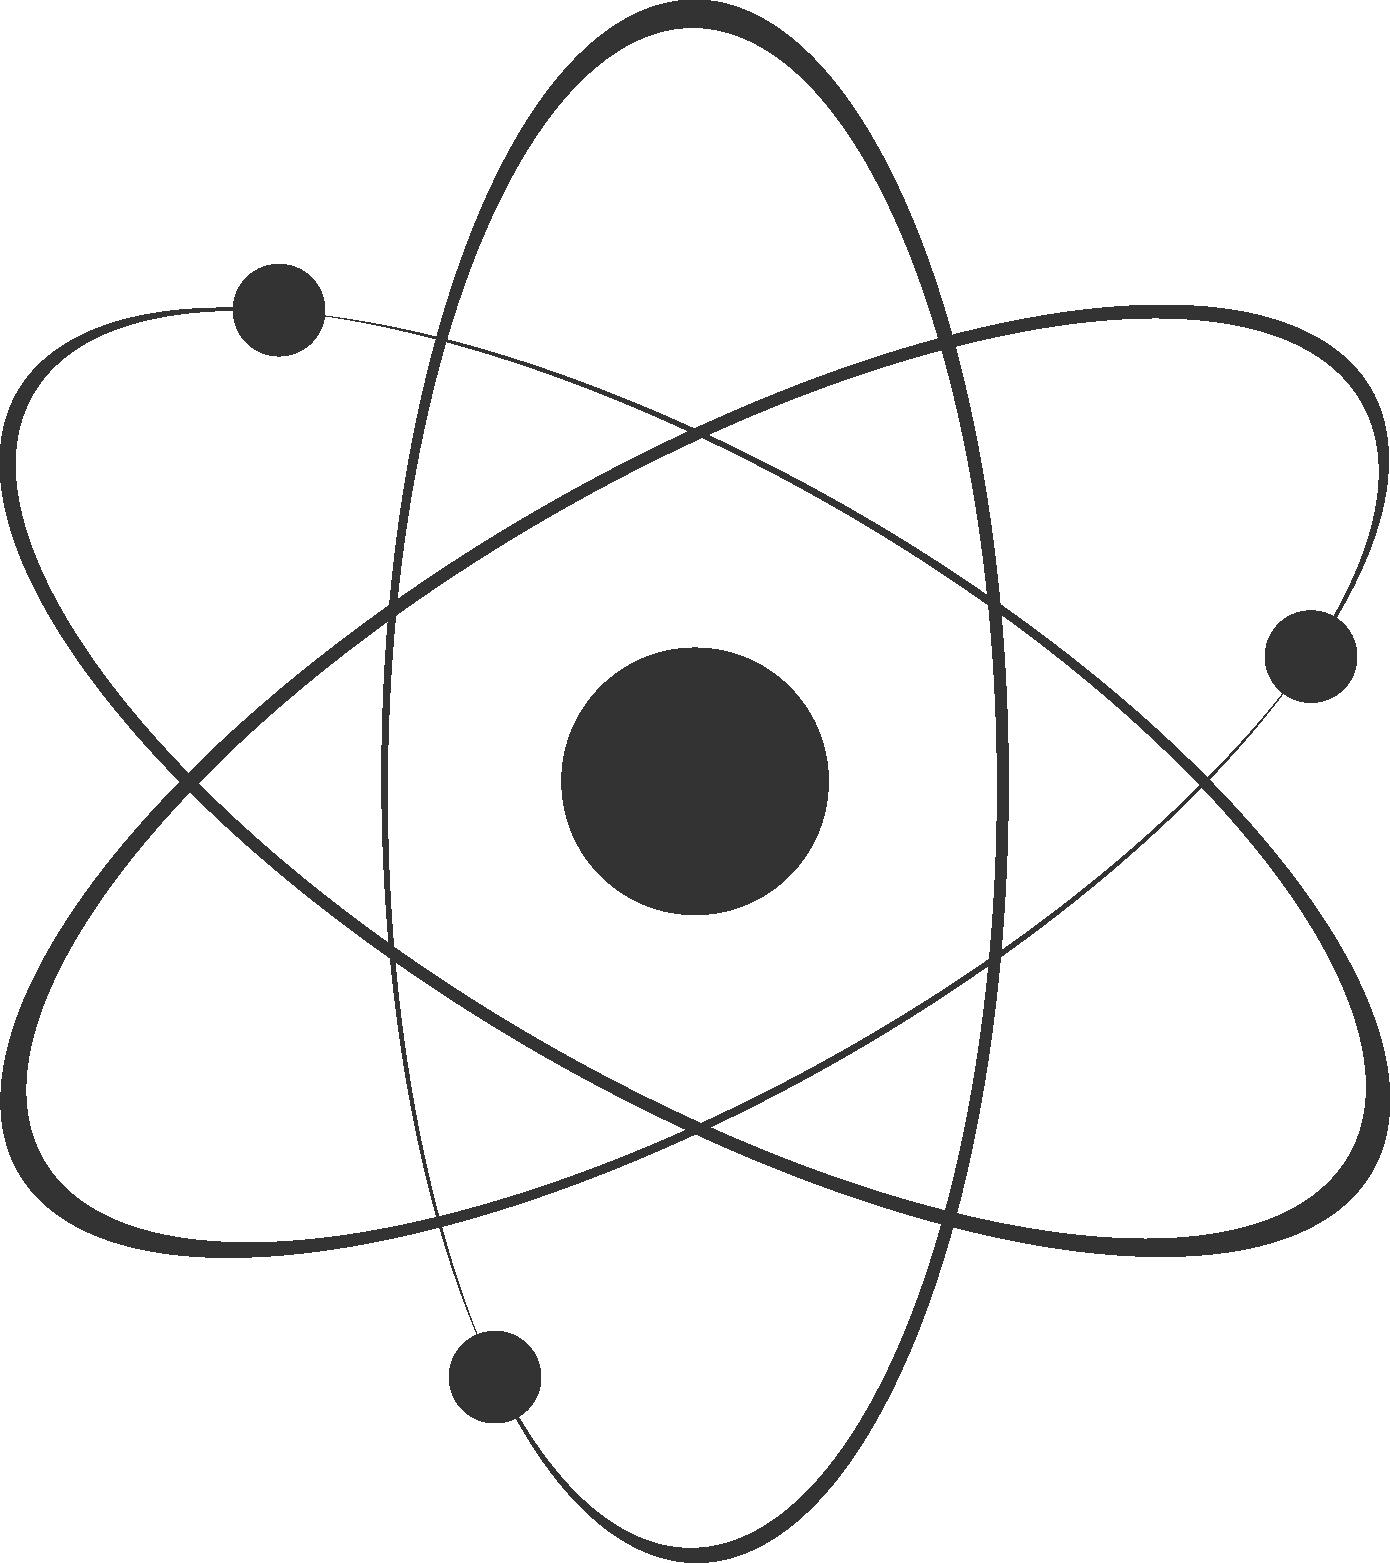 dosimetry services - r3xray